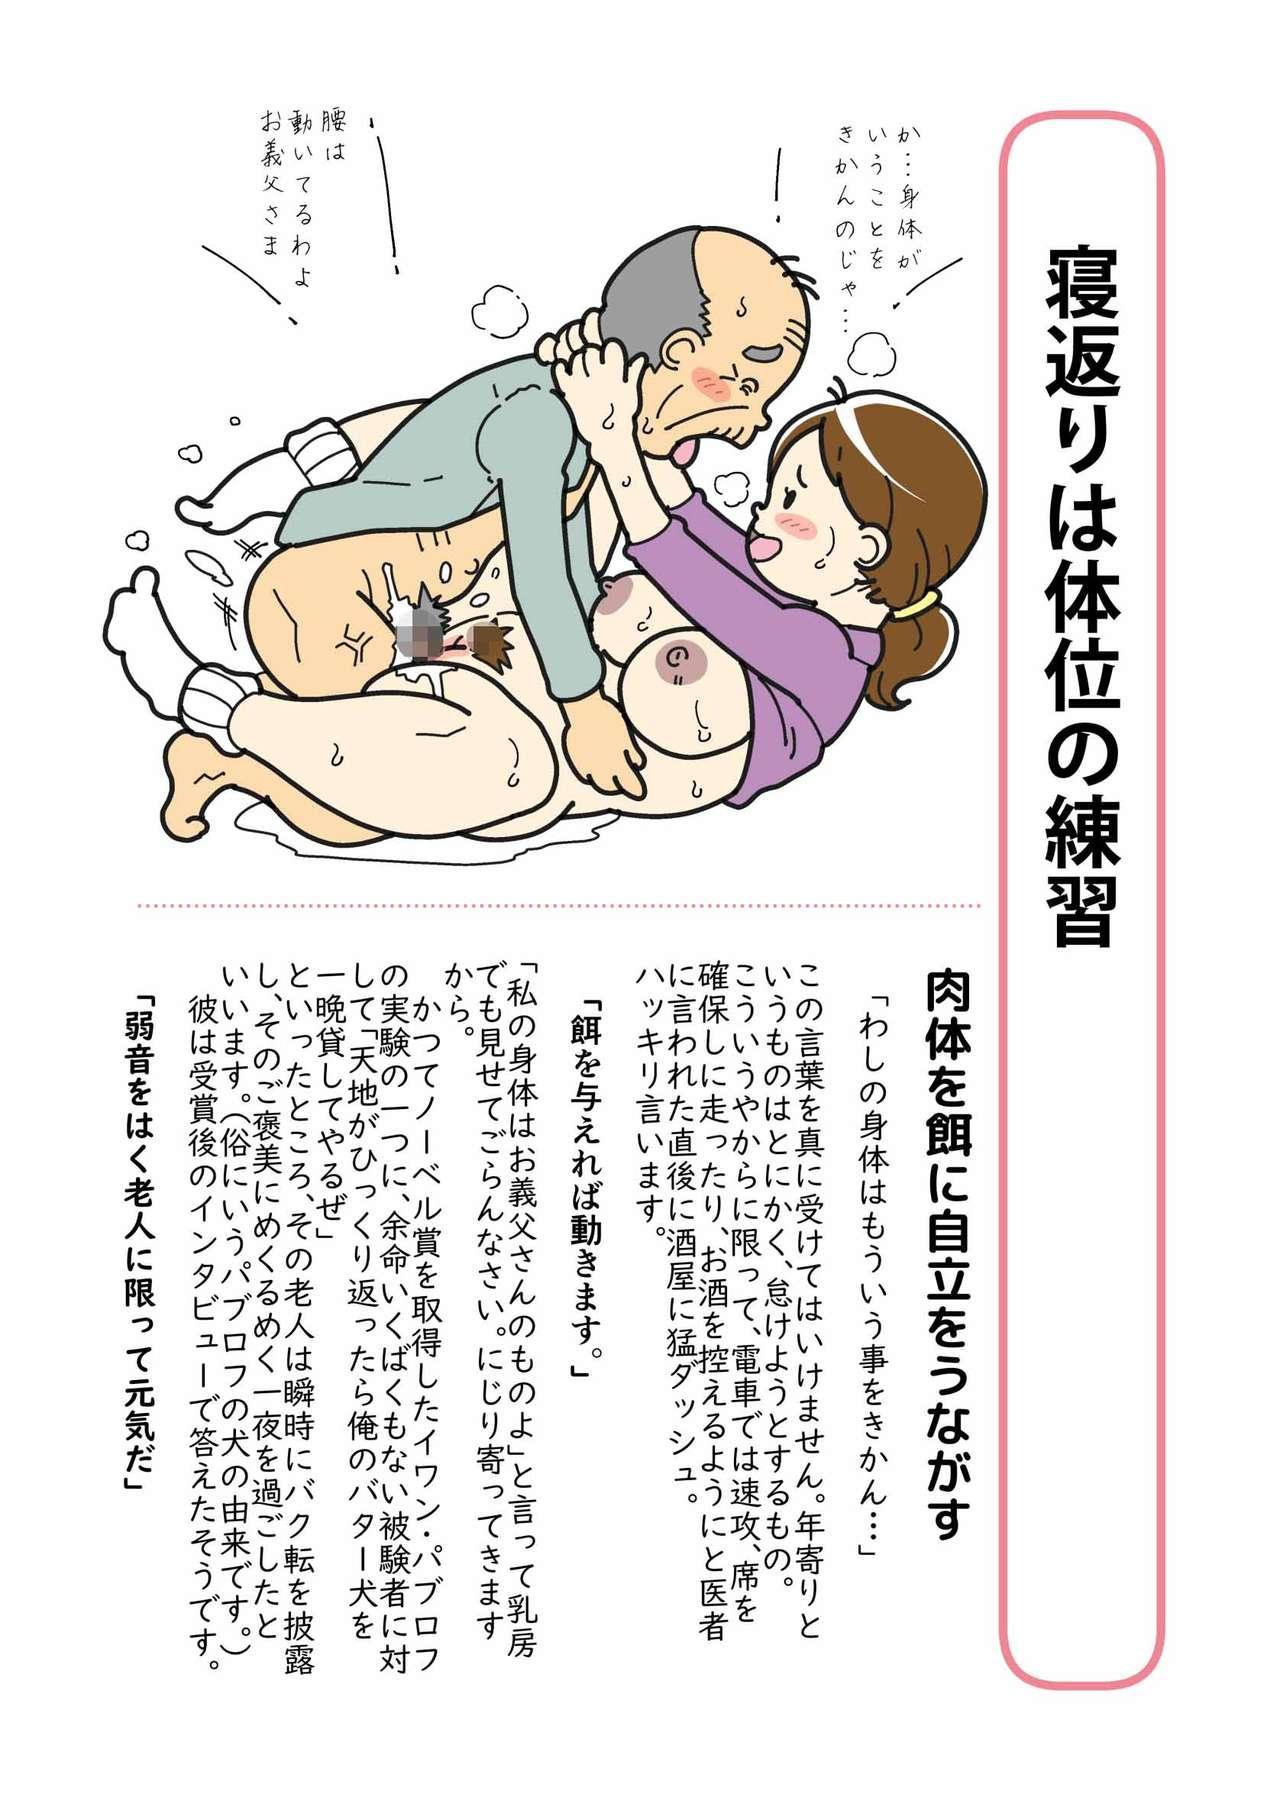 Isogasii Okaasan No Tamuno Sasa Rouzin Seikaigo | Guide for Elderly Sex Health Care to Busy Mom 17